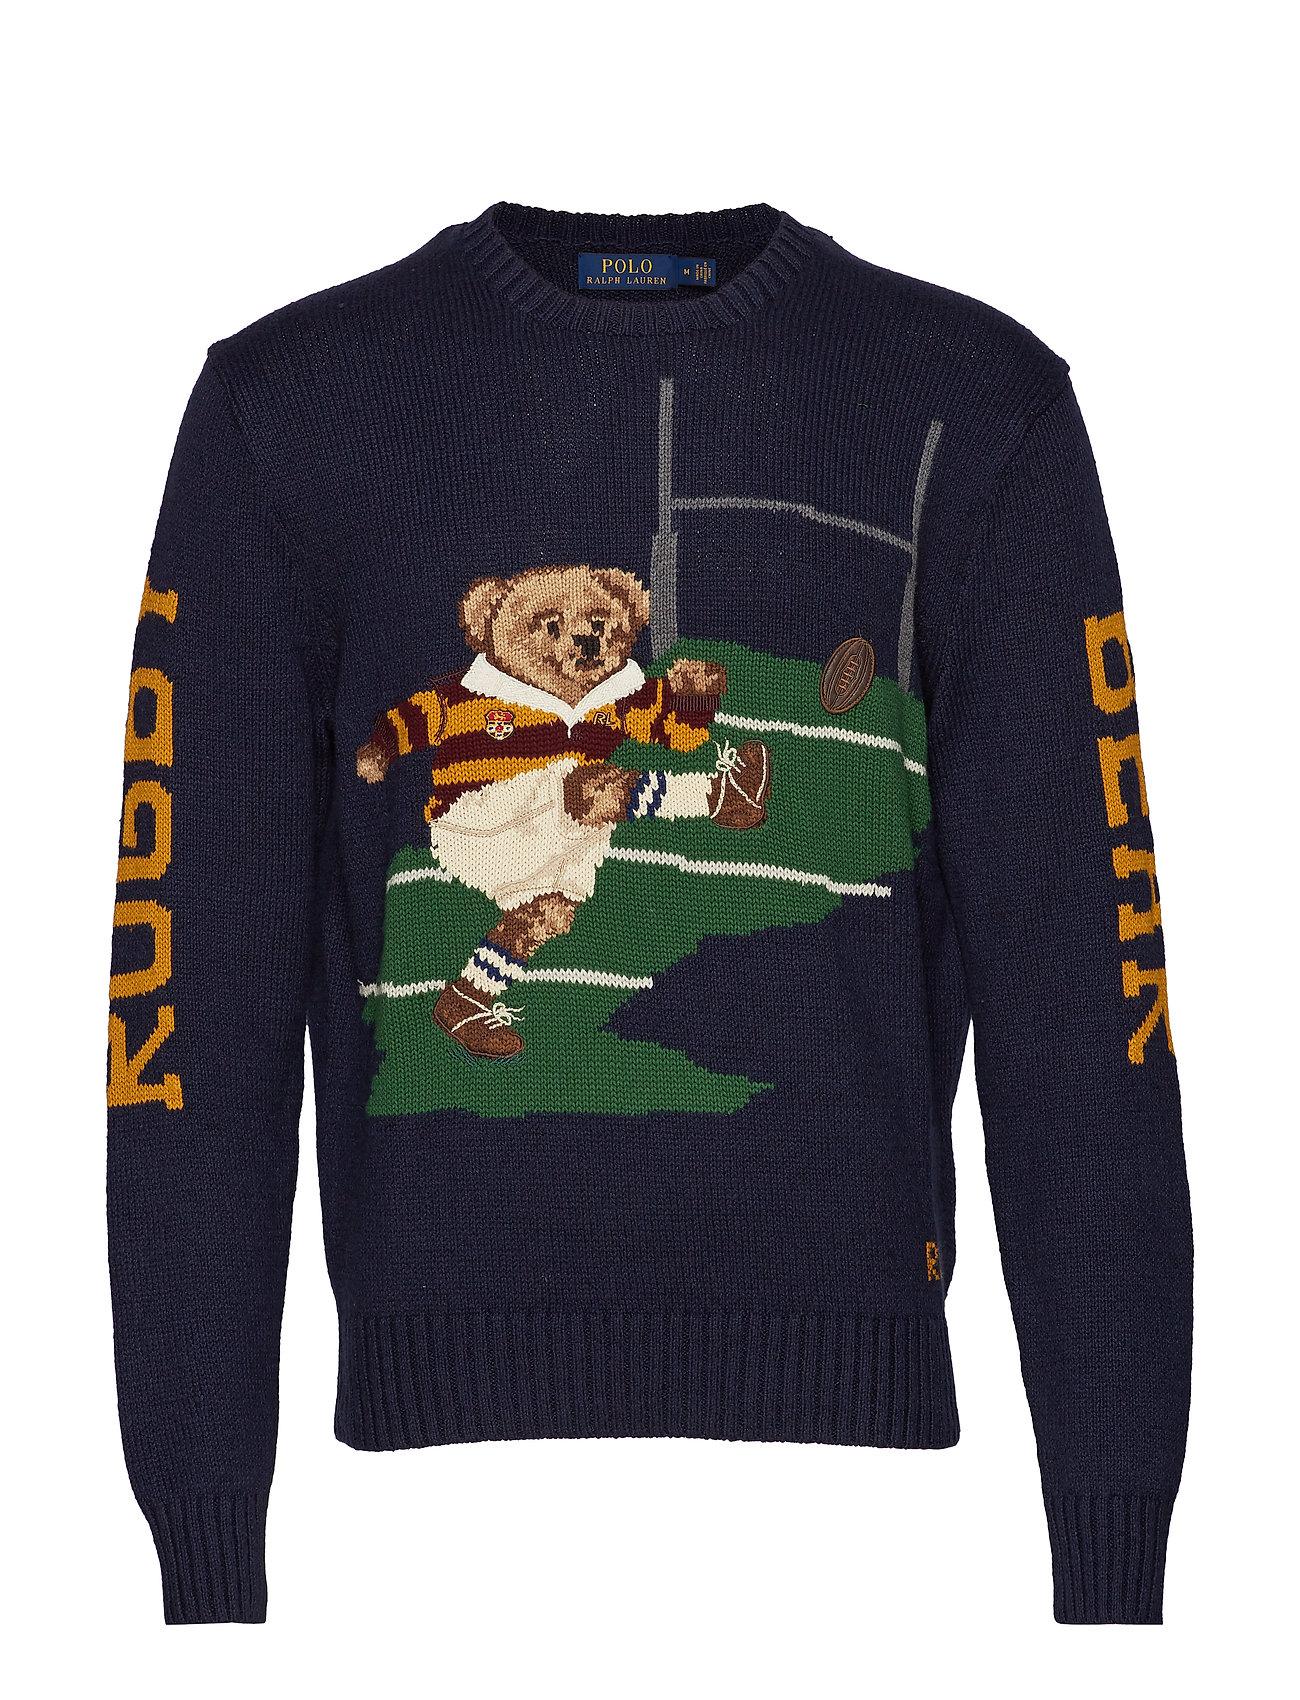 Polo Ralph Lauren Rugby Bear Sweater - NAVY